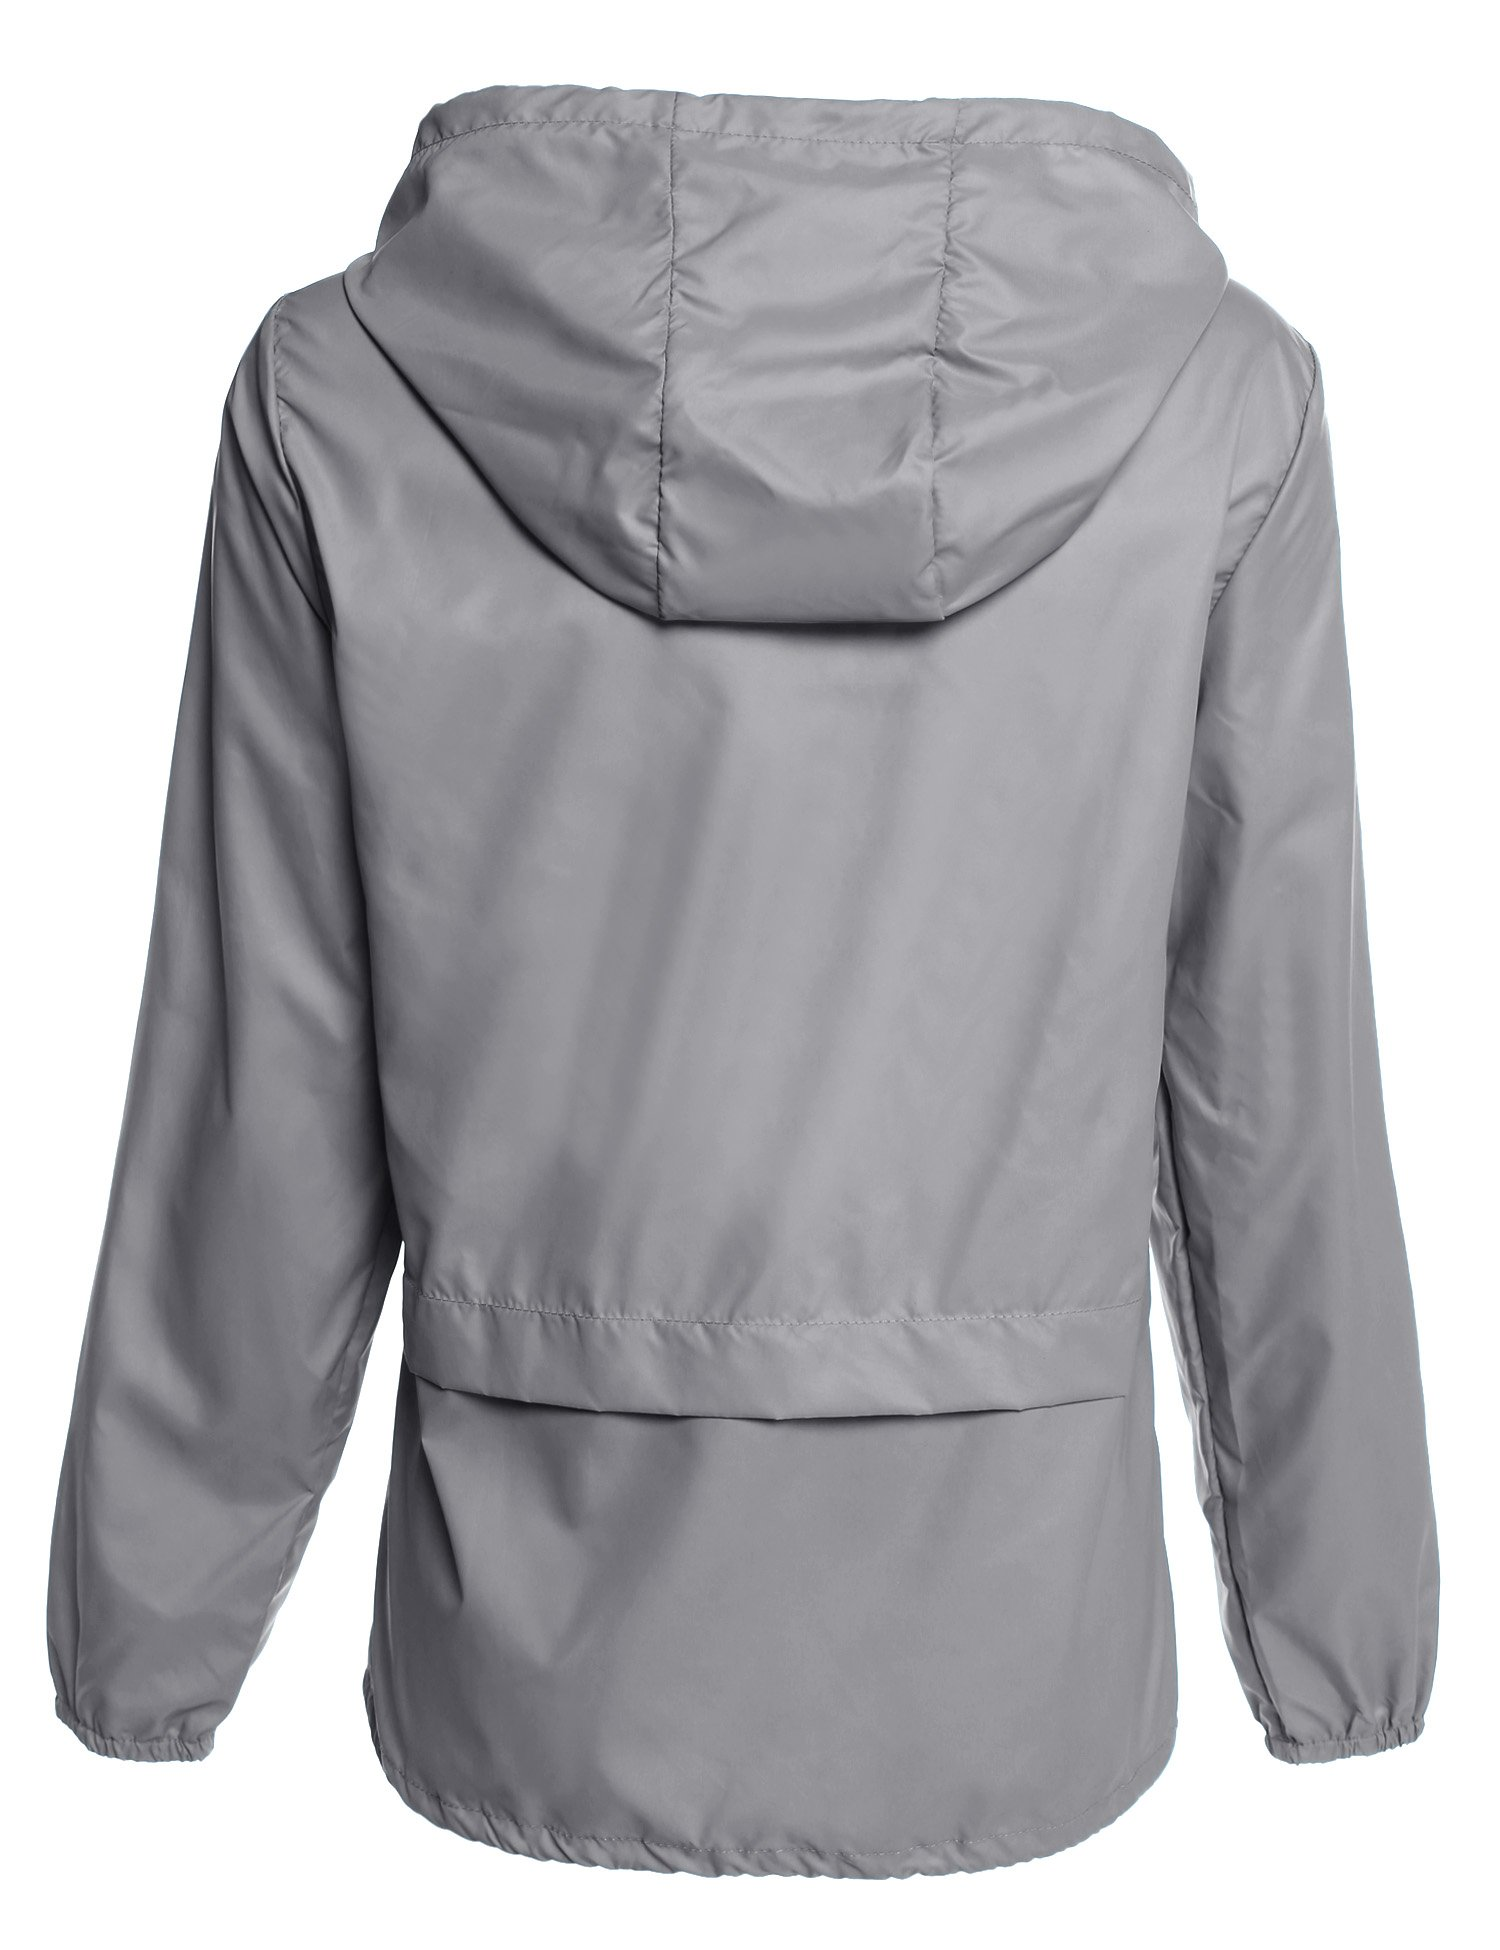 Beyove Women's Lightweight Rain Jacket Active Outdoor Waterproof Packable Hooded Raincoat by Beyove (Image #3)